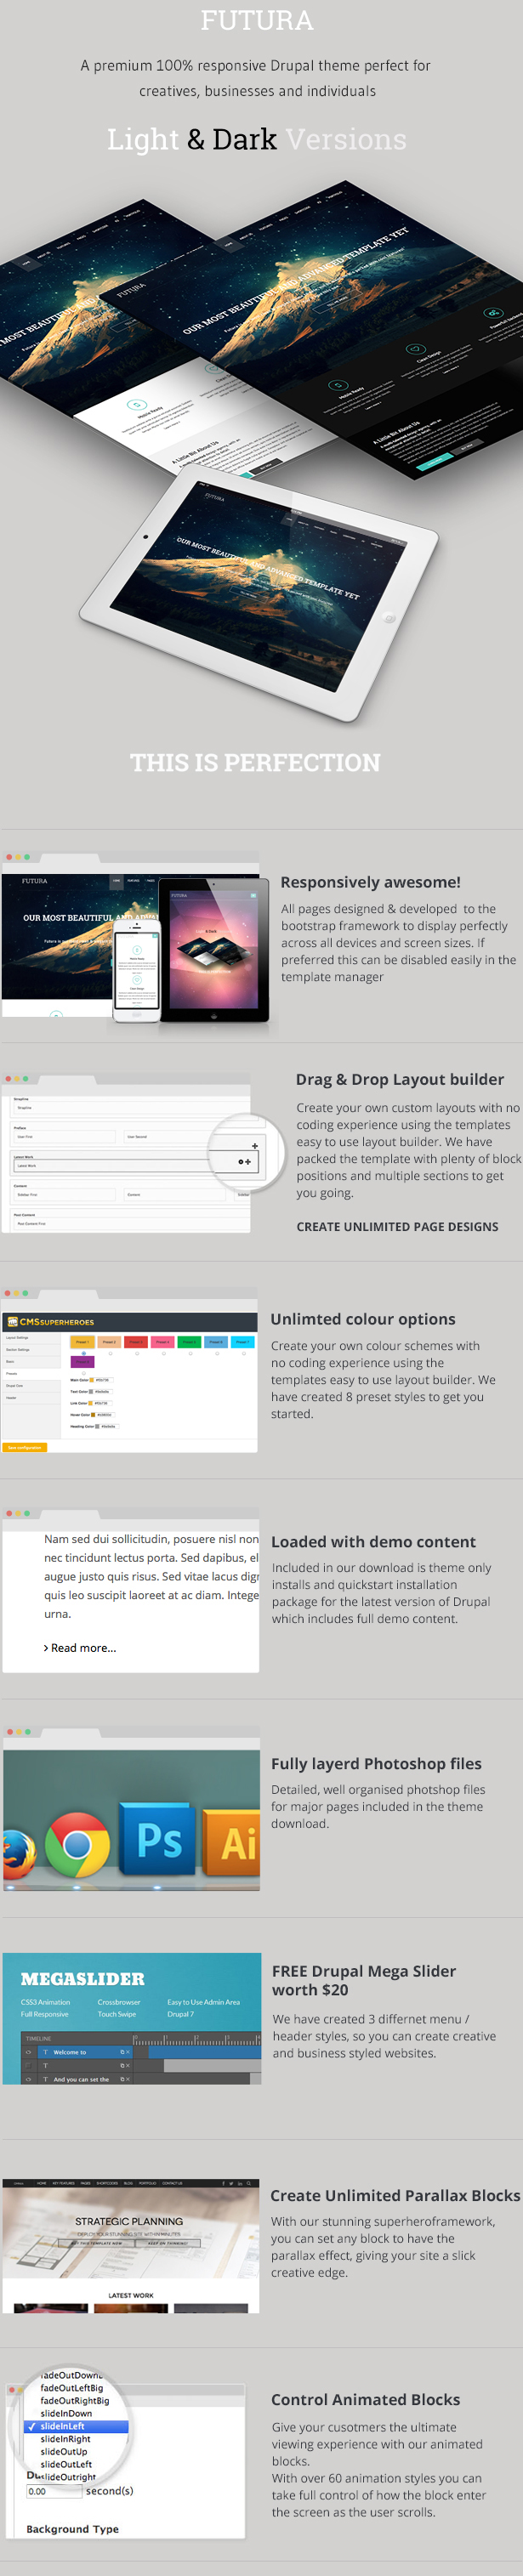 Futura, MultiPurpose Creative Drupal Theme - 1